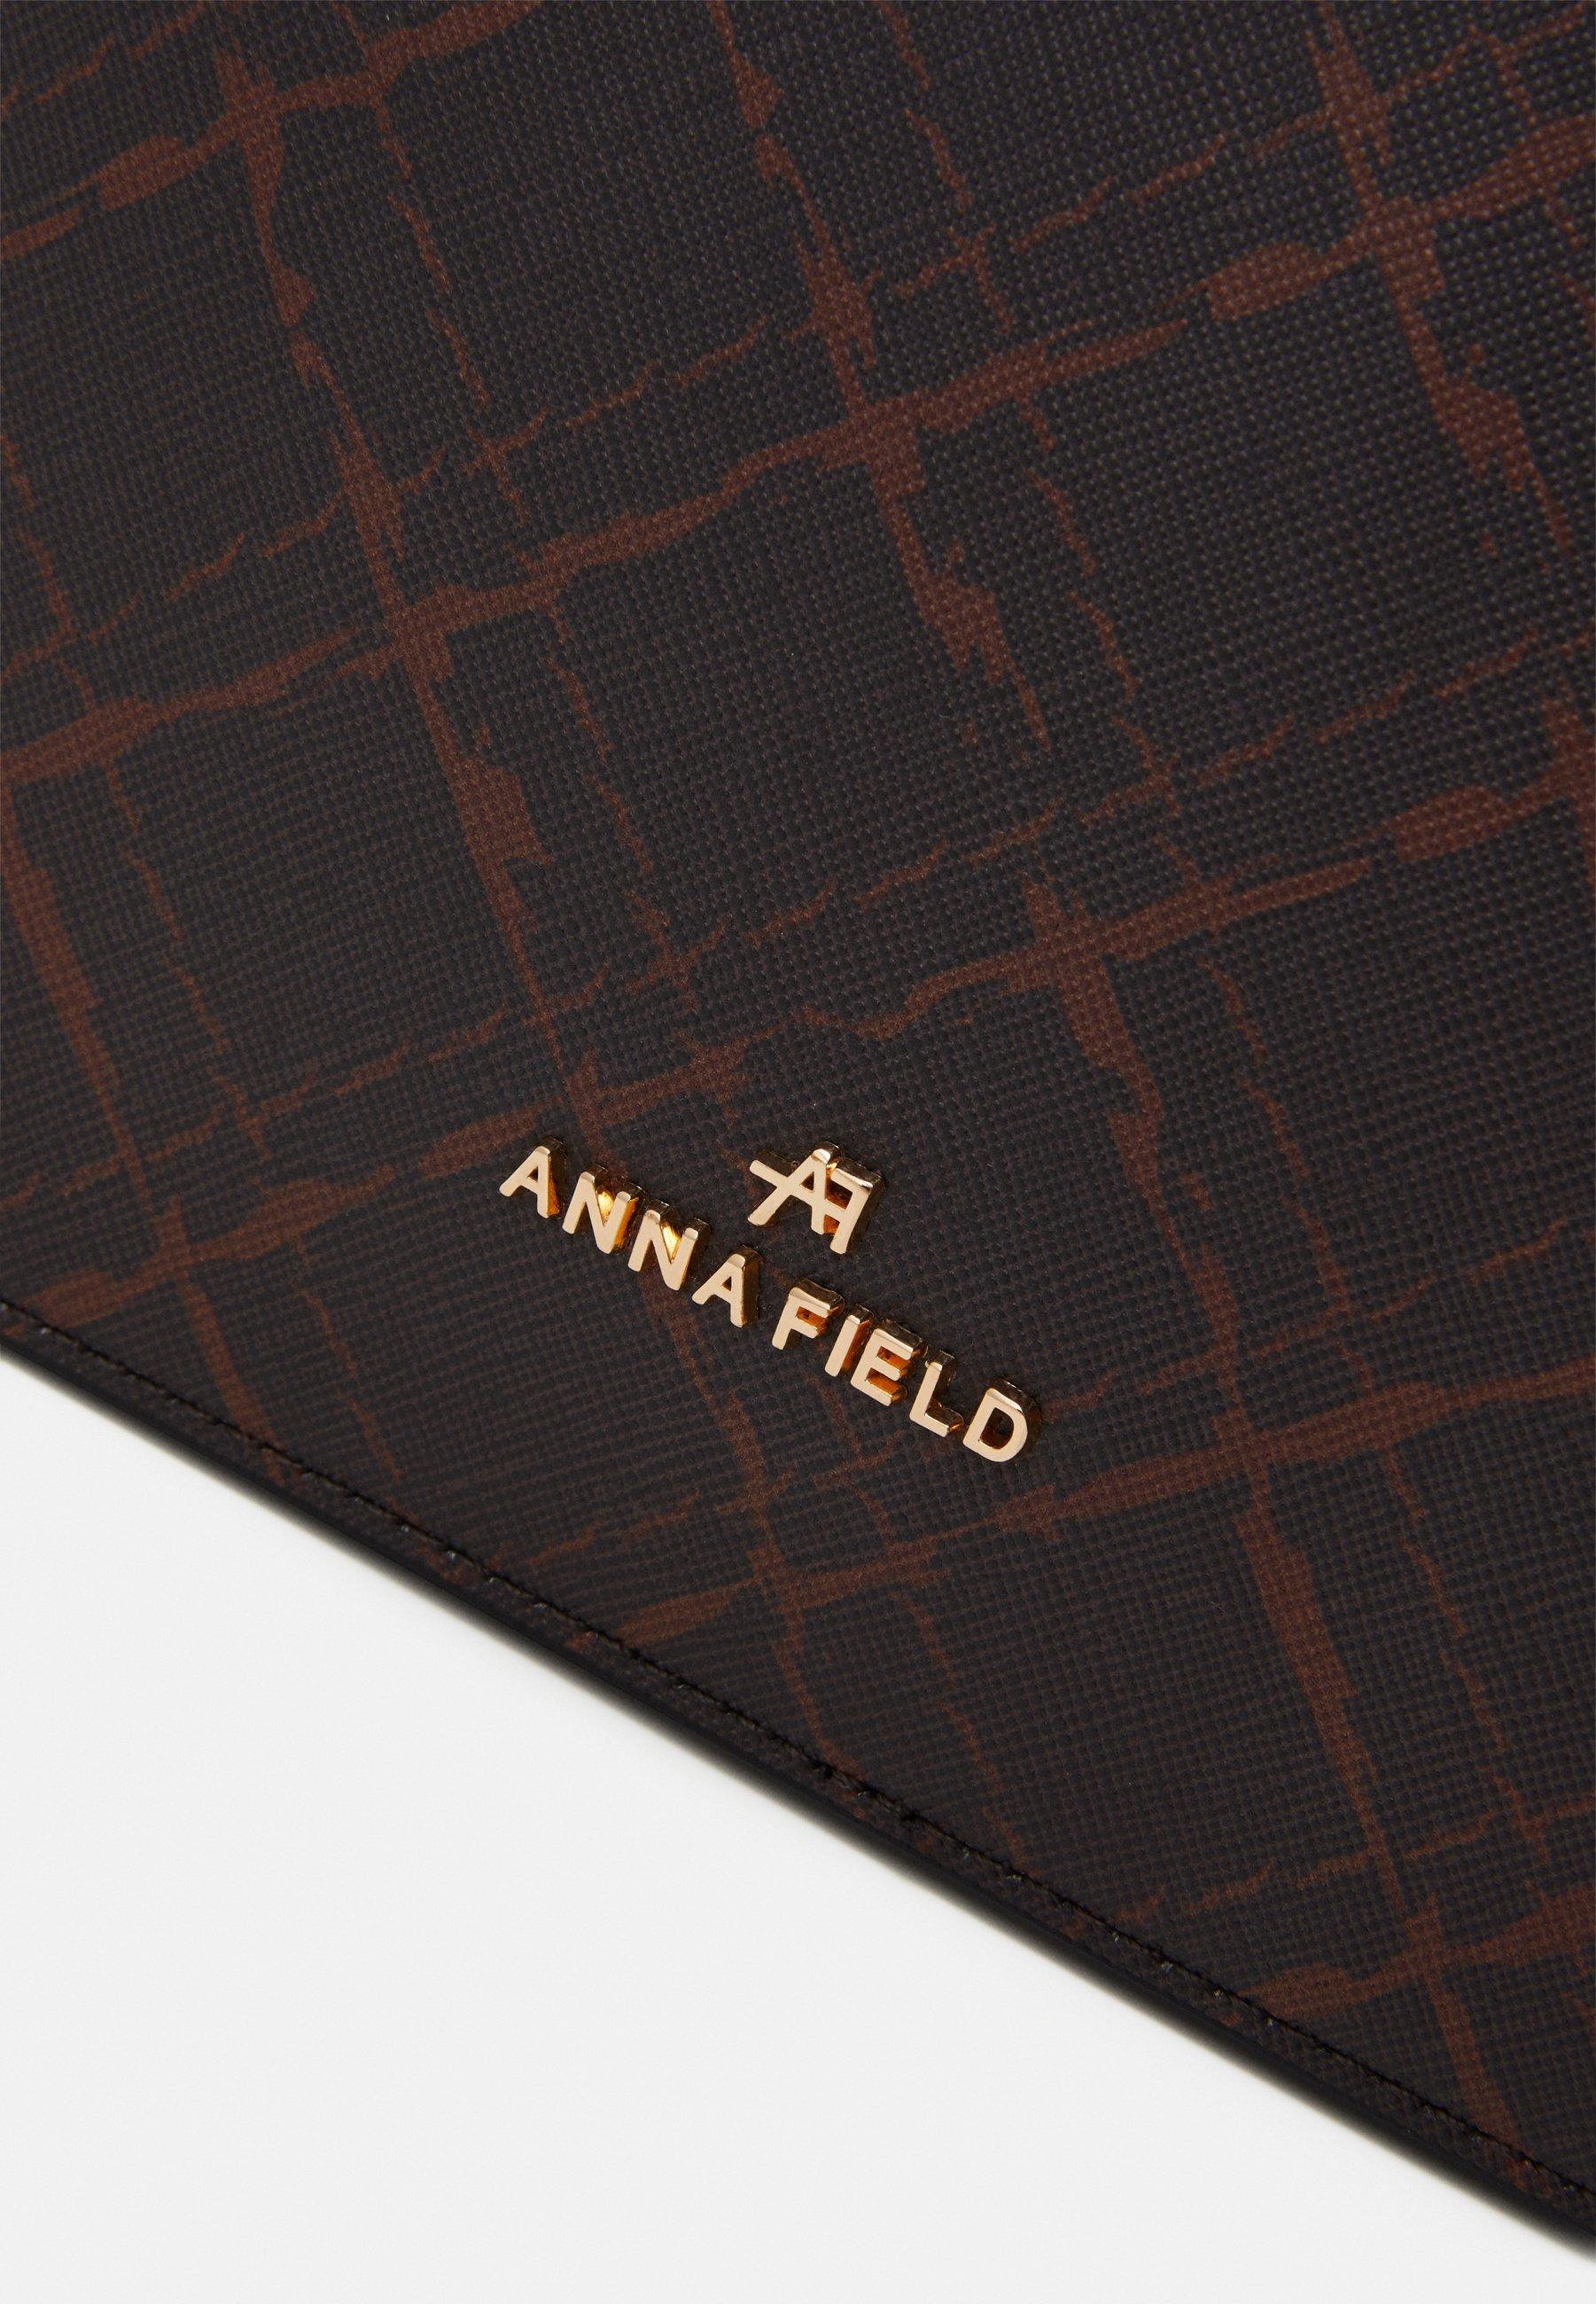 Anna Field Skulderveske - black/svart gi5OMI7JQ3CdZ6b